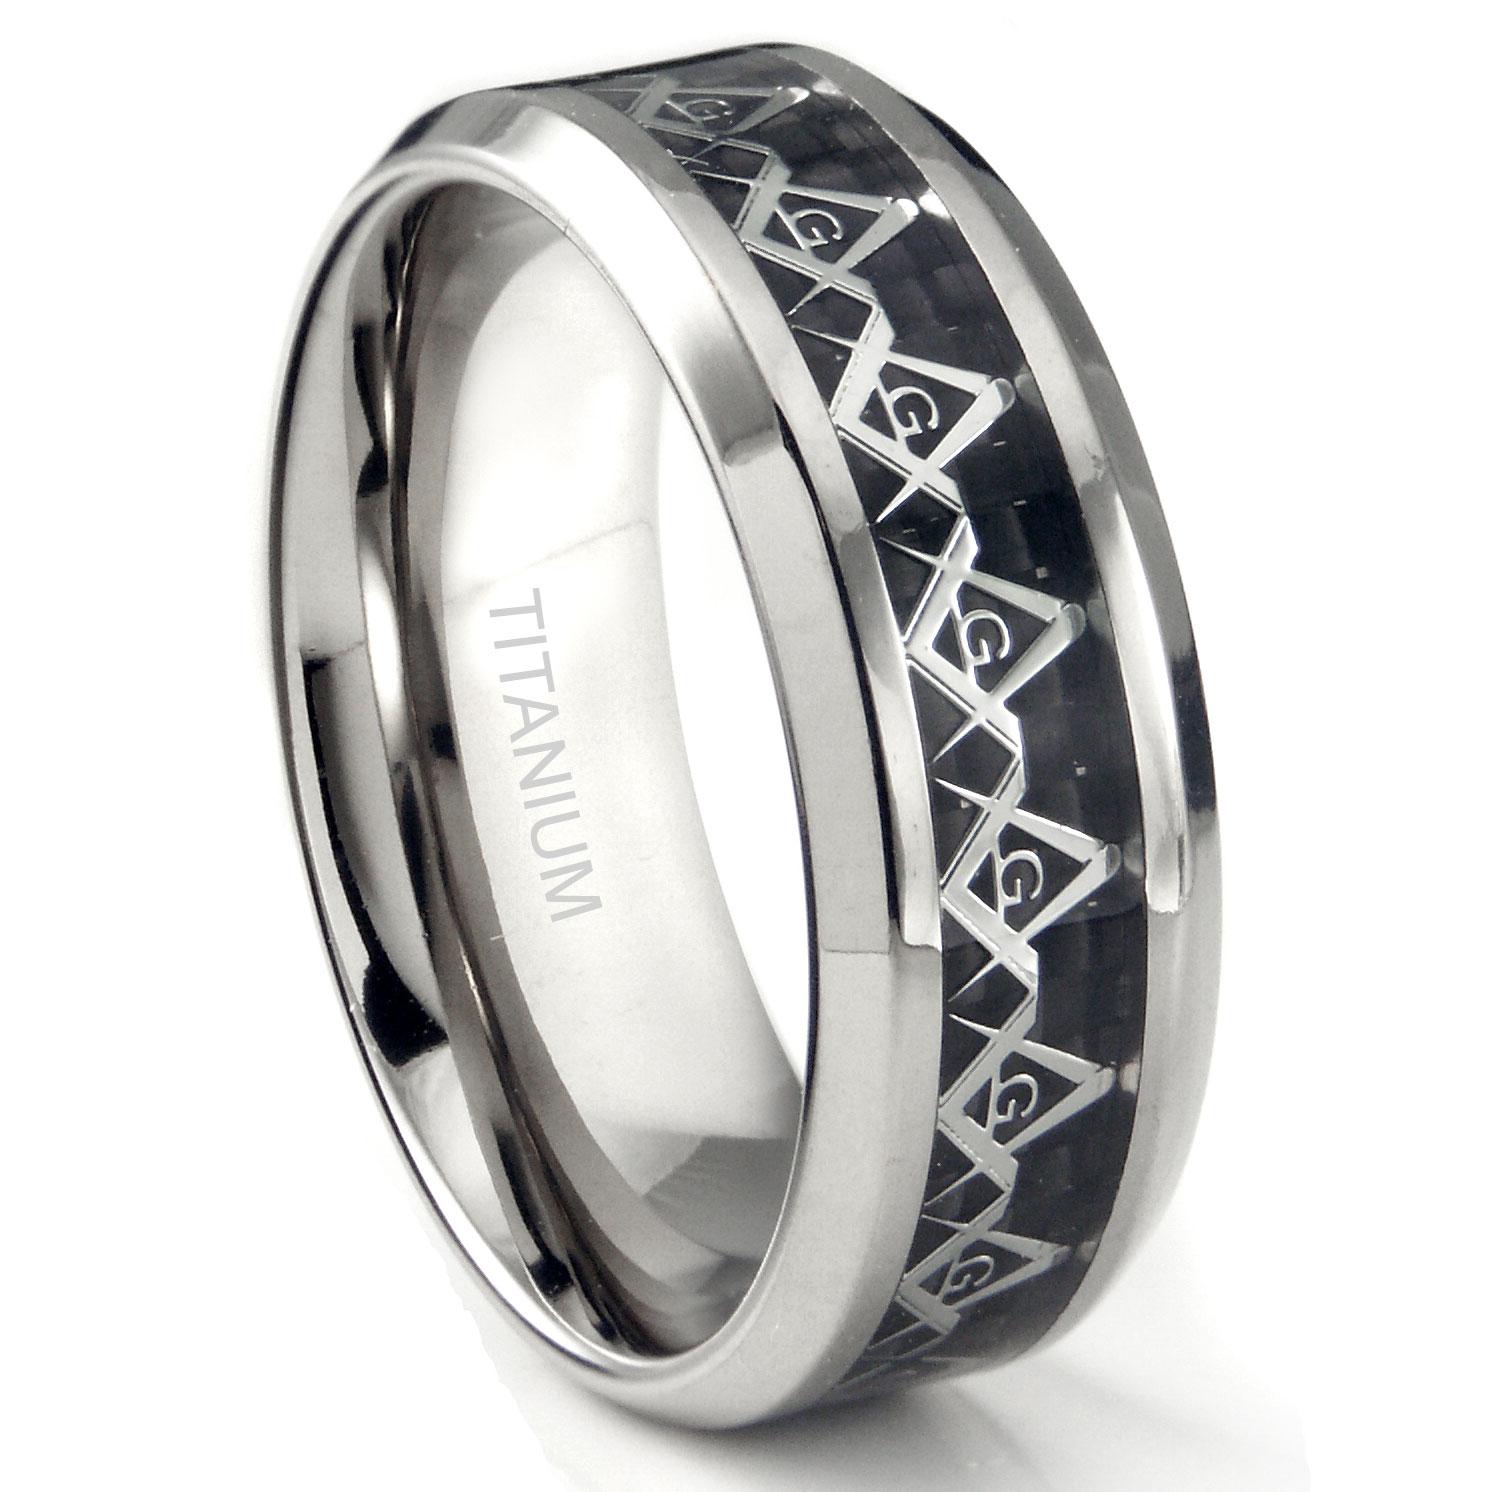 Titanium 8MM Masonic Symbol Inlay over Black Carbon Fiber Inlay Wedding Band Ring P carbon fiber wedding ring Loading zoom